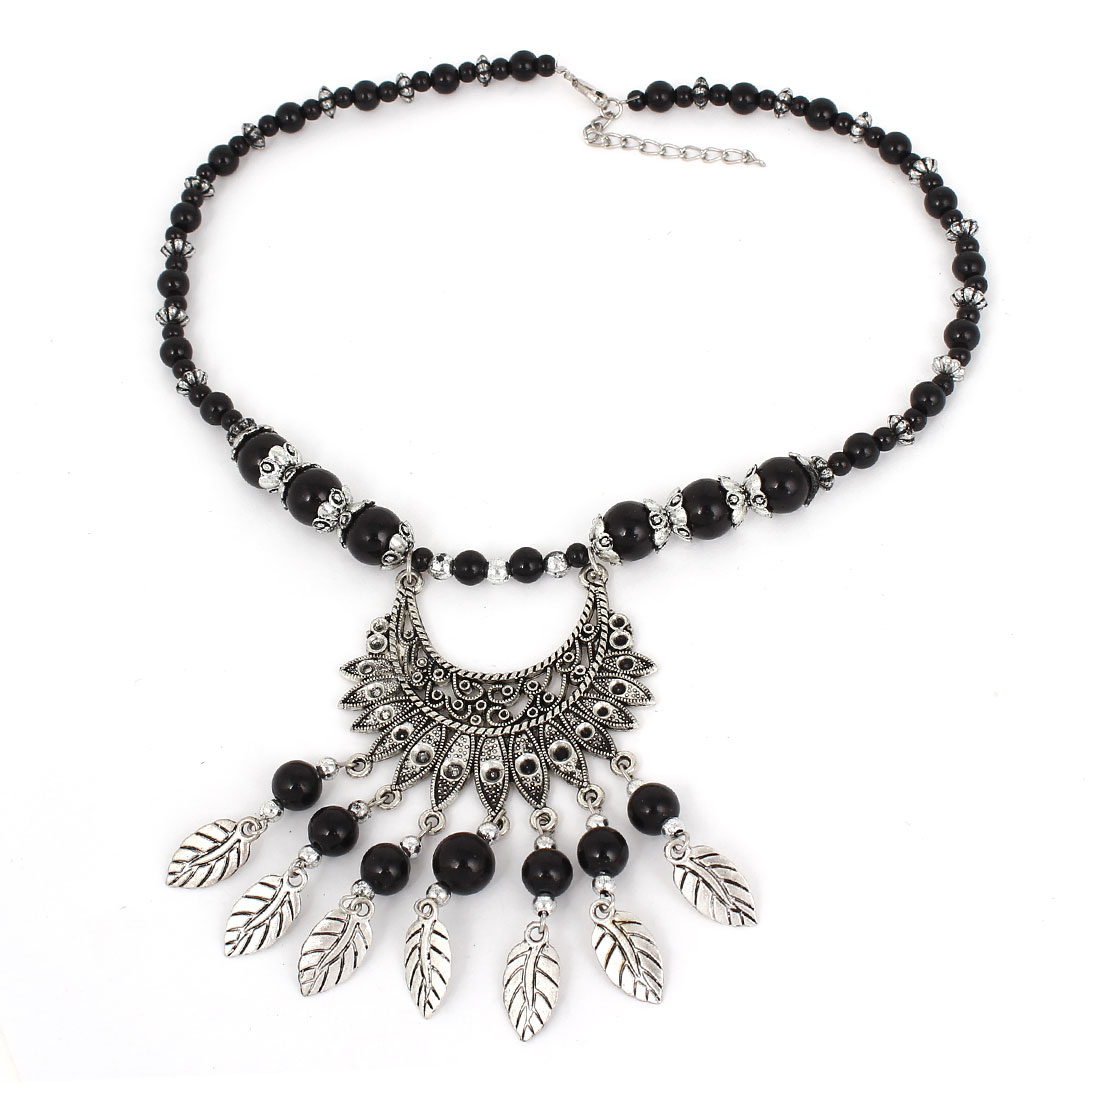 Lady Black Beads Silver Gray Leaf Shape Pendant Party Bib Necklace